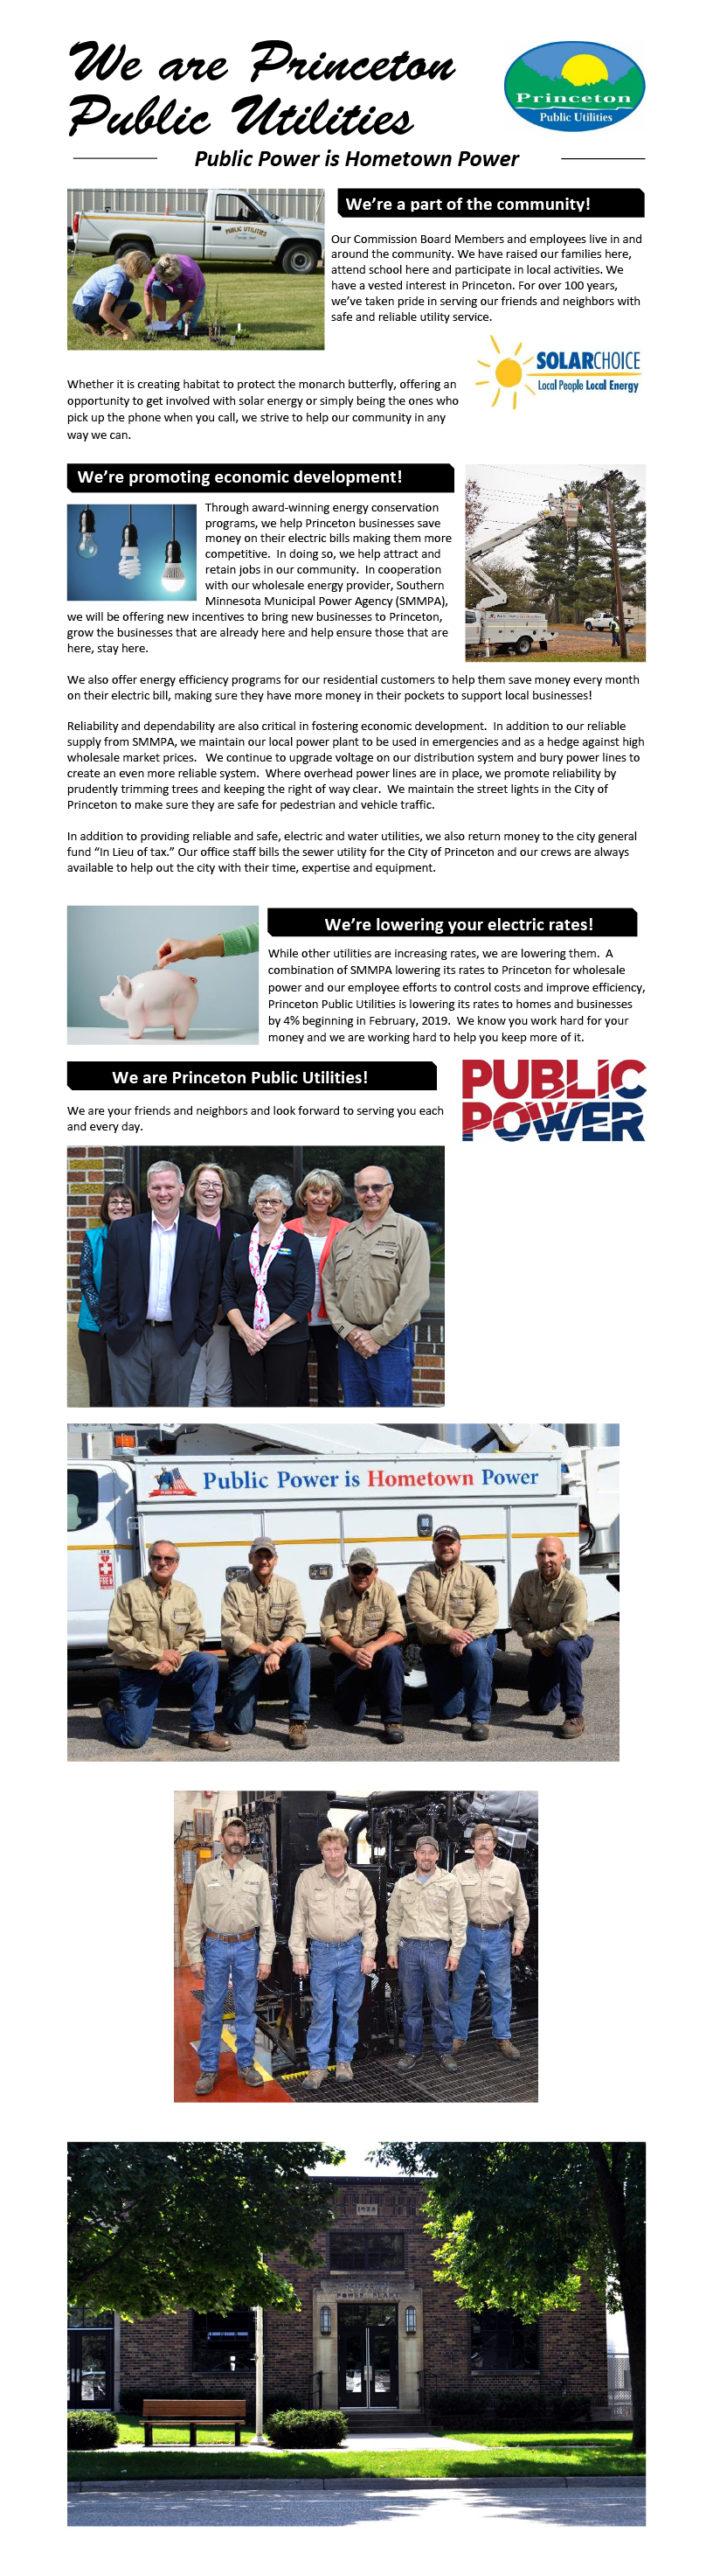 We Are Princeton Public Utilities